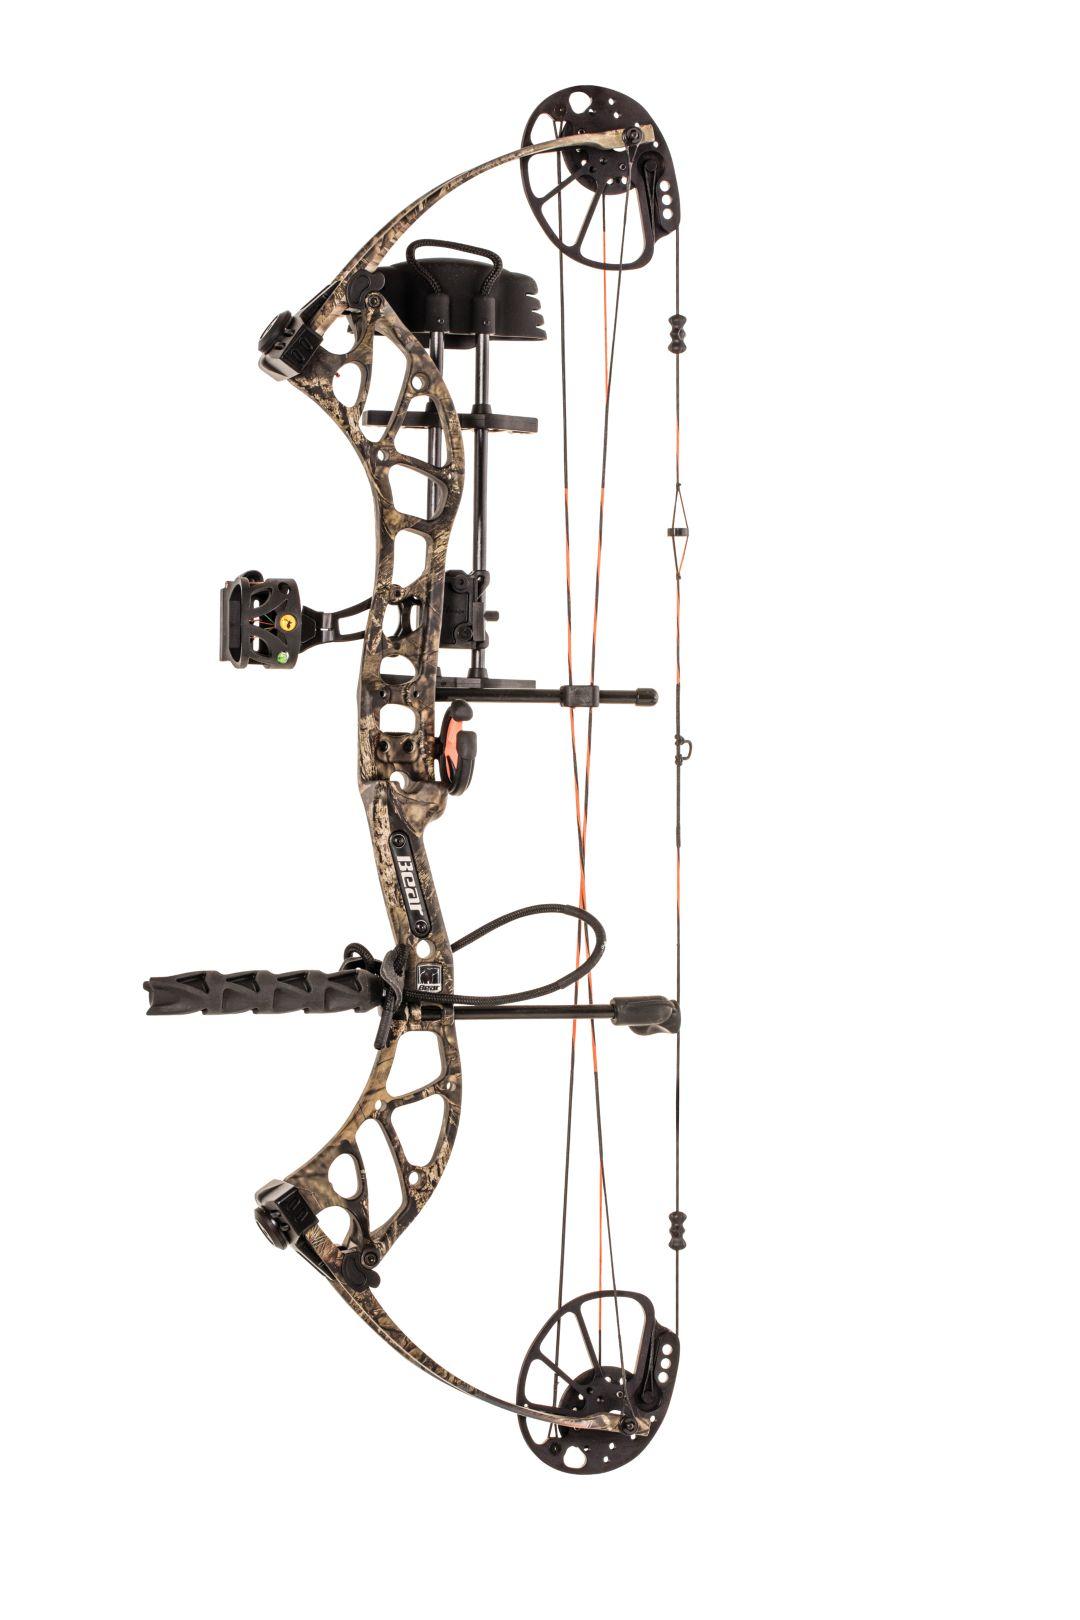 Archery Outdoor Sports Kind-Hearted Bear Weather Arrow Rest Rh